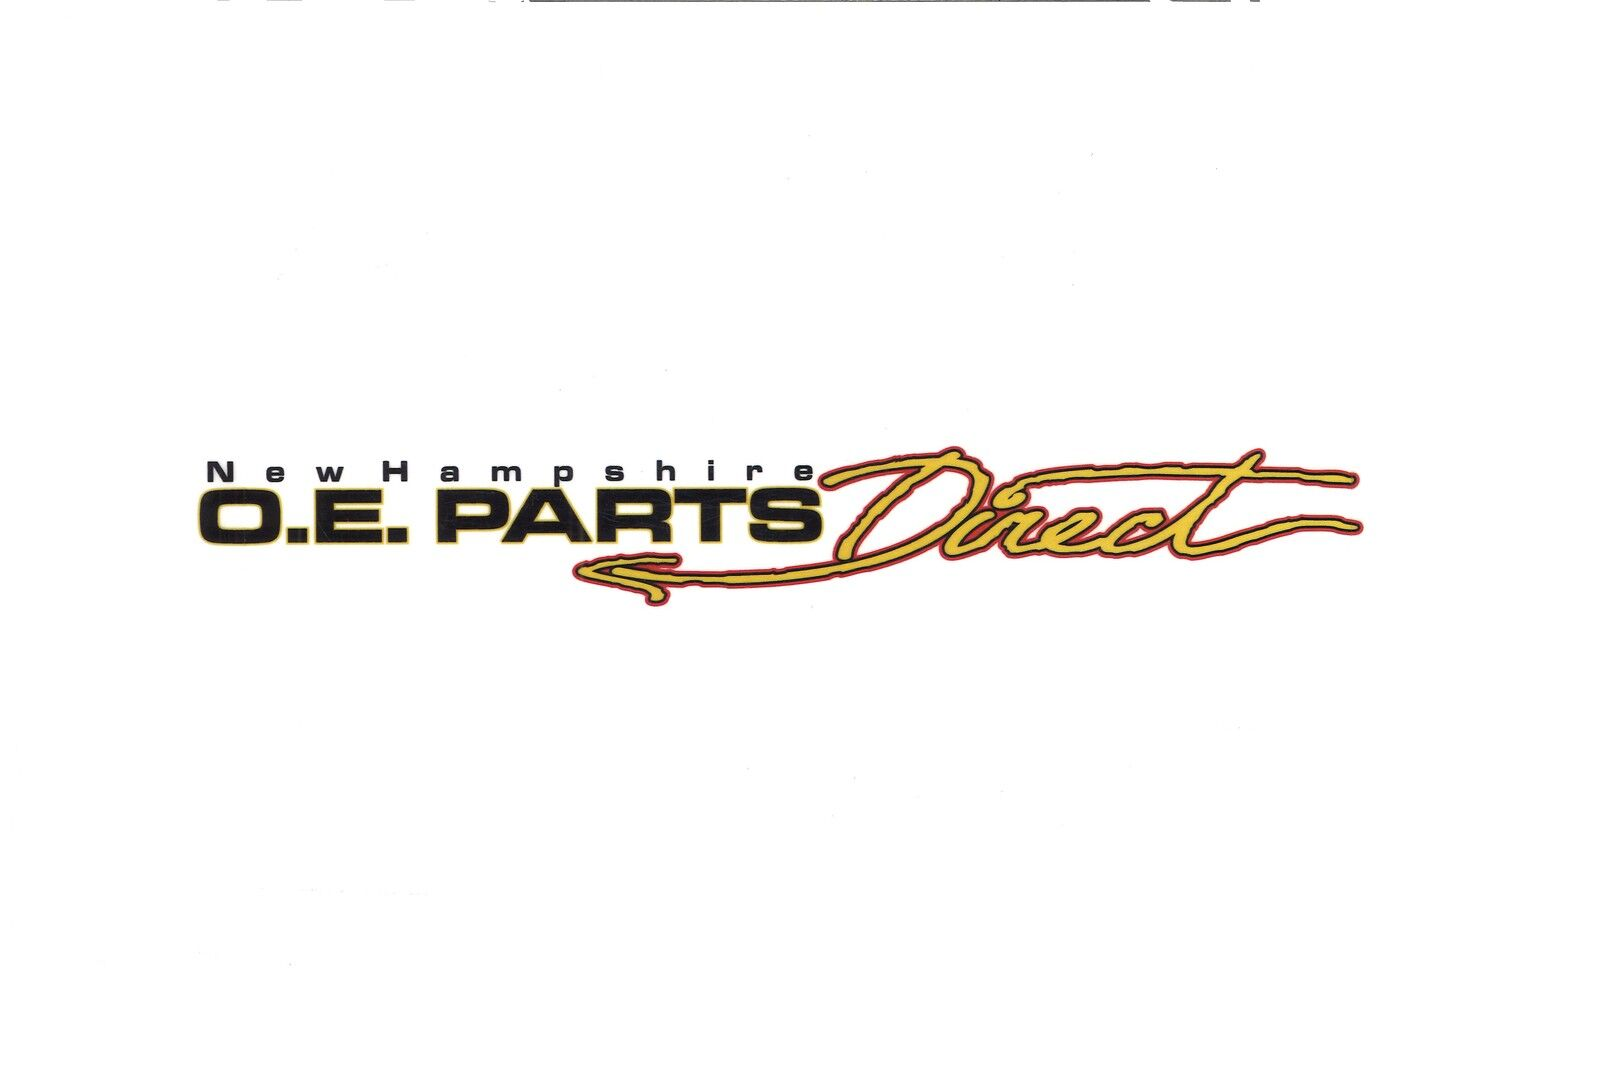 NH O.E. Parts Direct